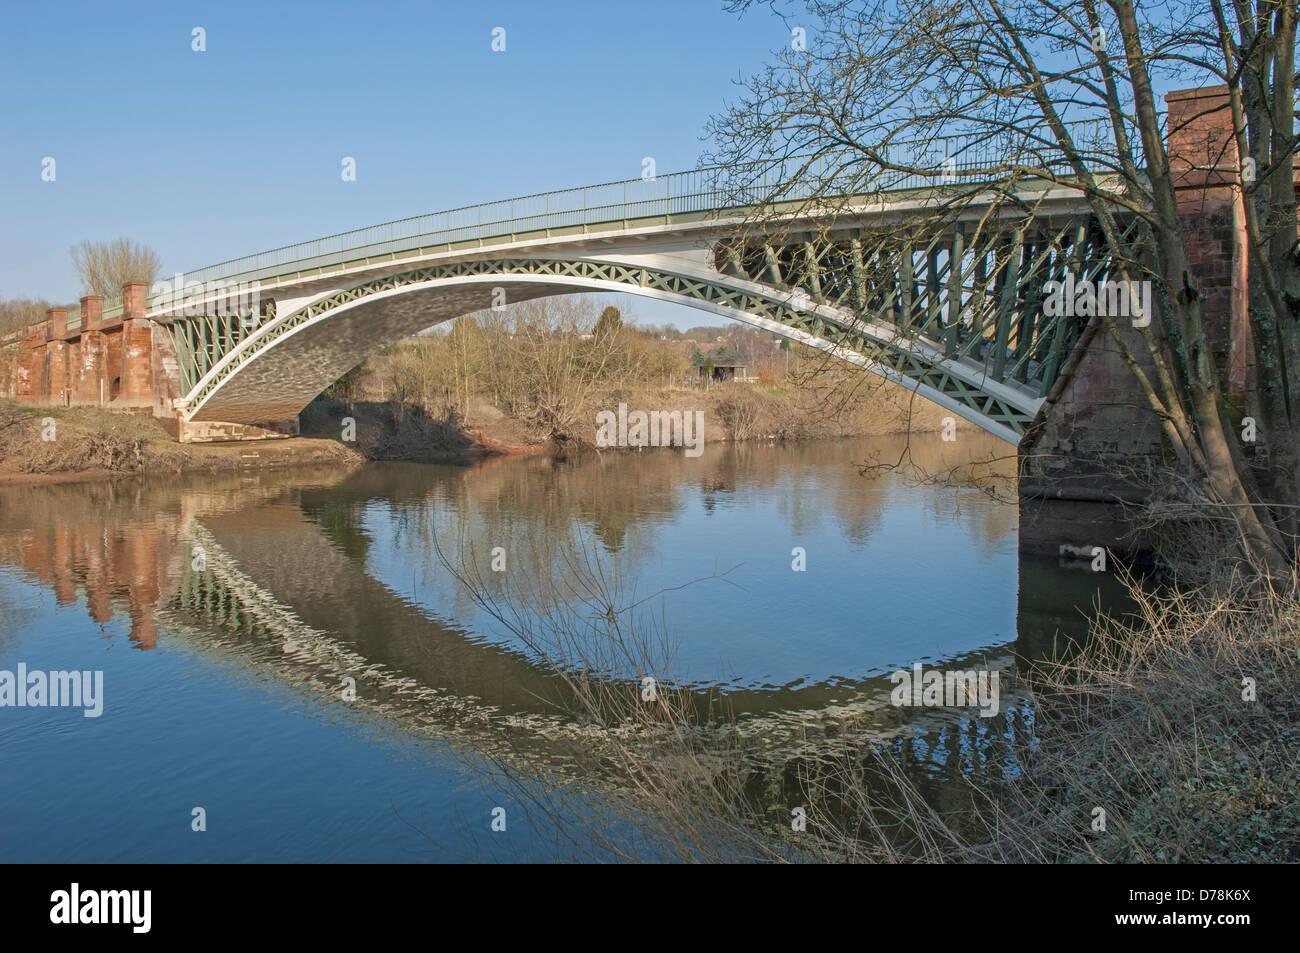 Holt Fleet Bridge over the River Severn at Holt Fleet in Worcestershire, England - Stock Image